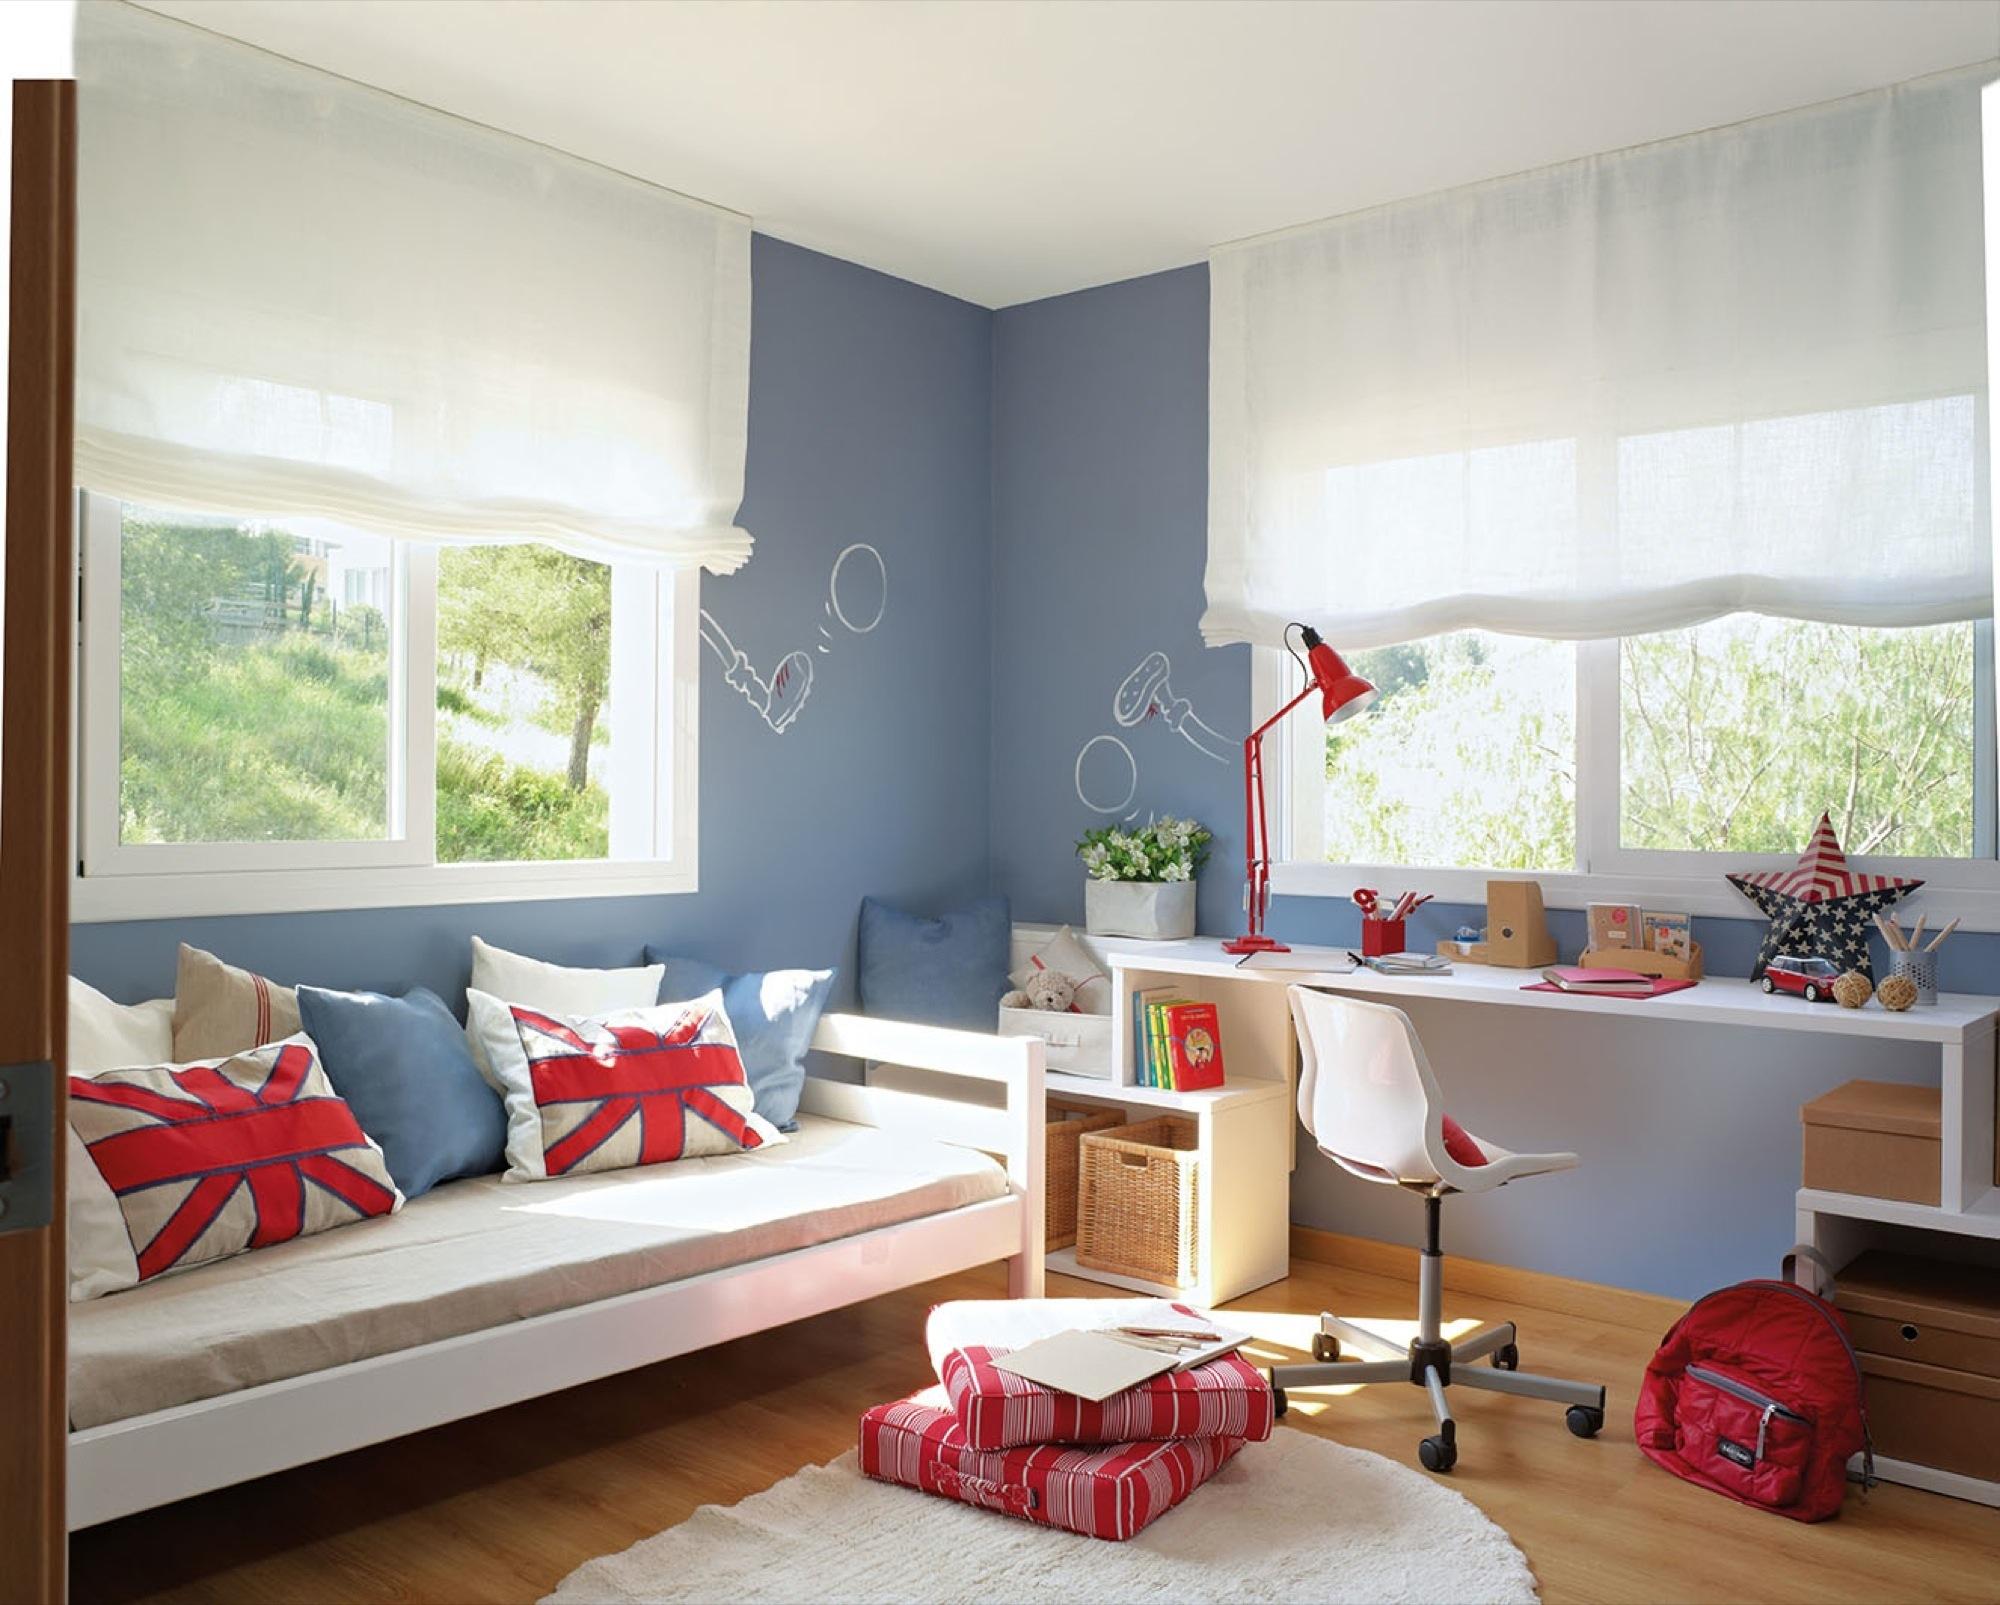 Pintar la casa excellent cmo pintar la casa with pintar - Ideas para pintar casa ...